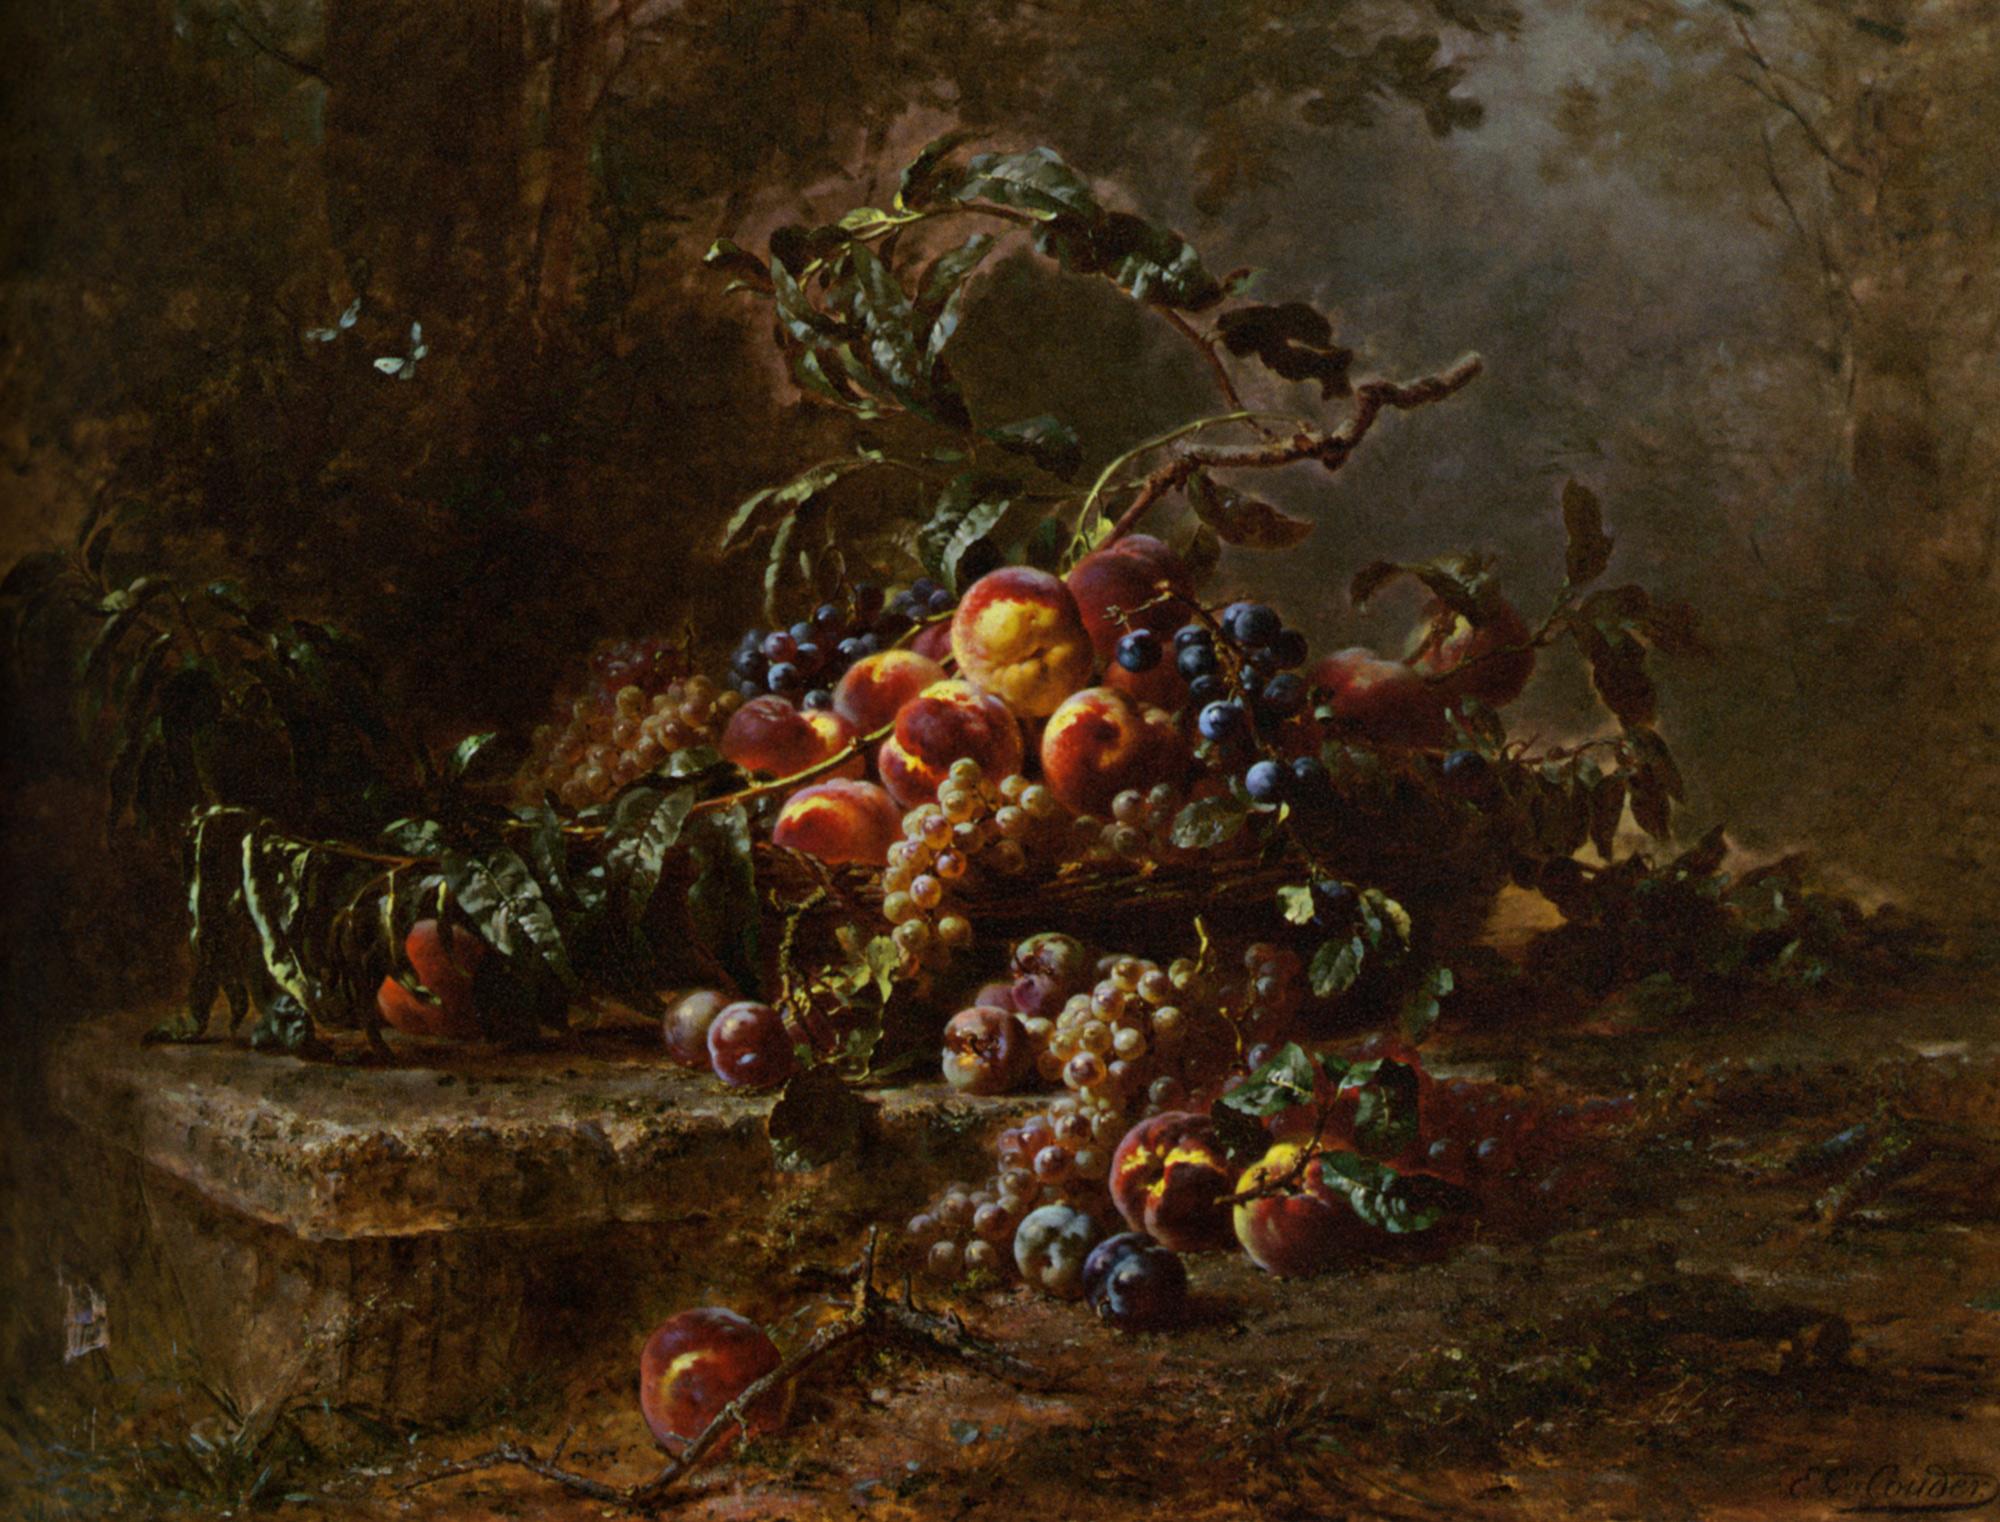 Still Life with Fruits on a Stone Ledge  :: Gustave Emile Couder - Still-lives with fruit ôîòî